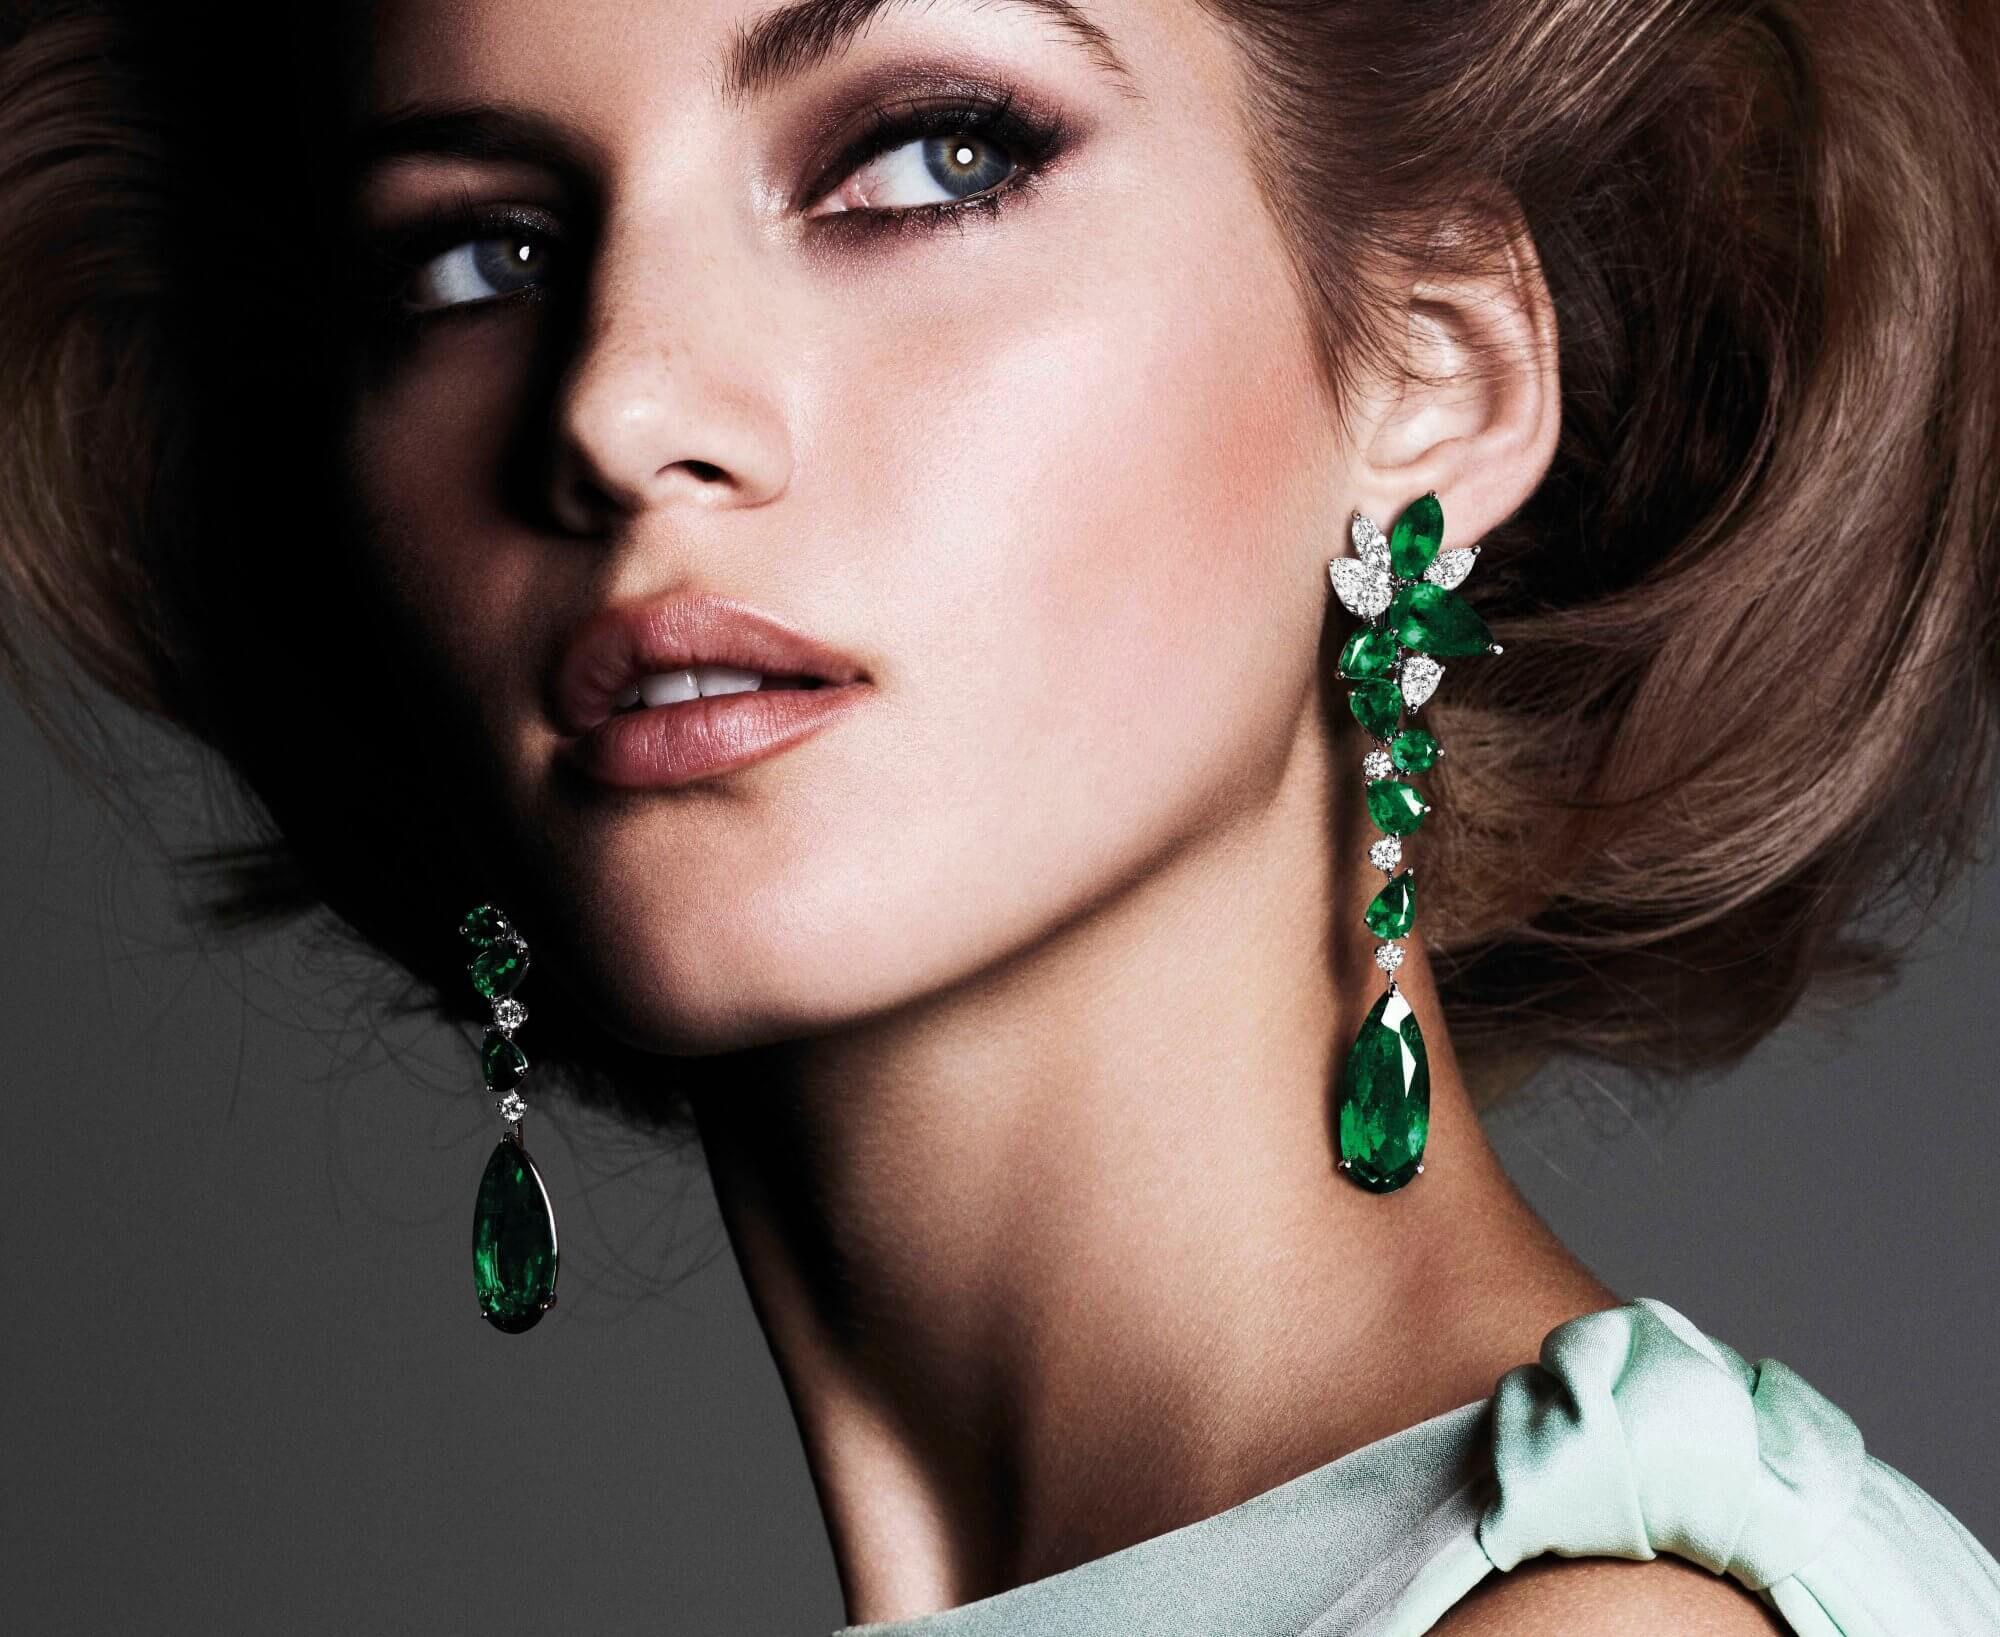 A model wearing Graff emerald and diamond earrings